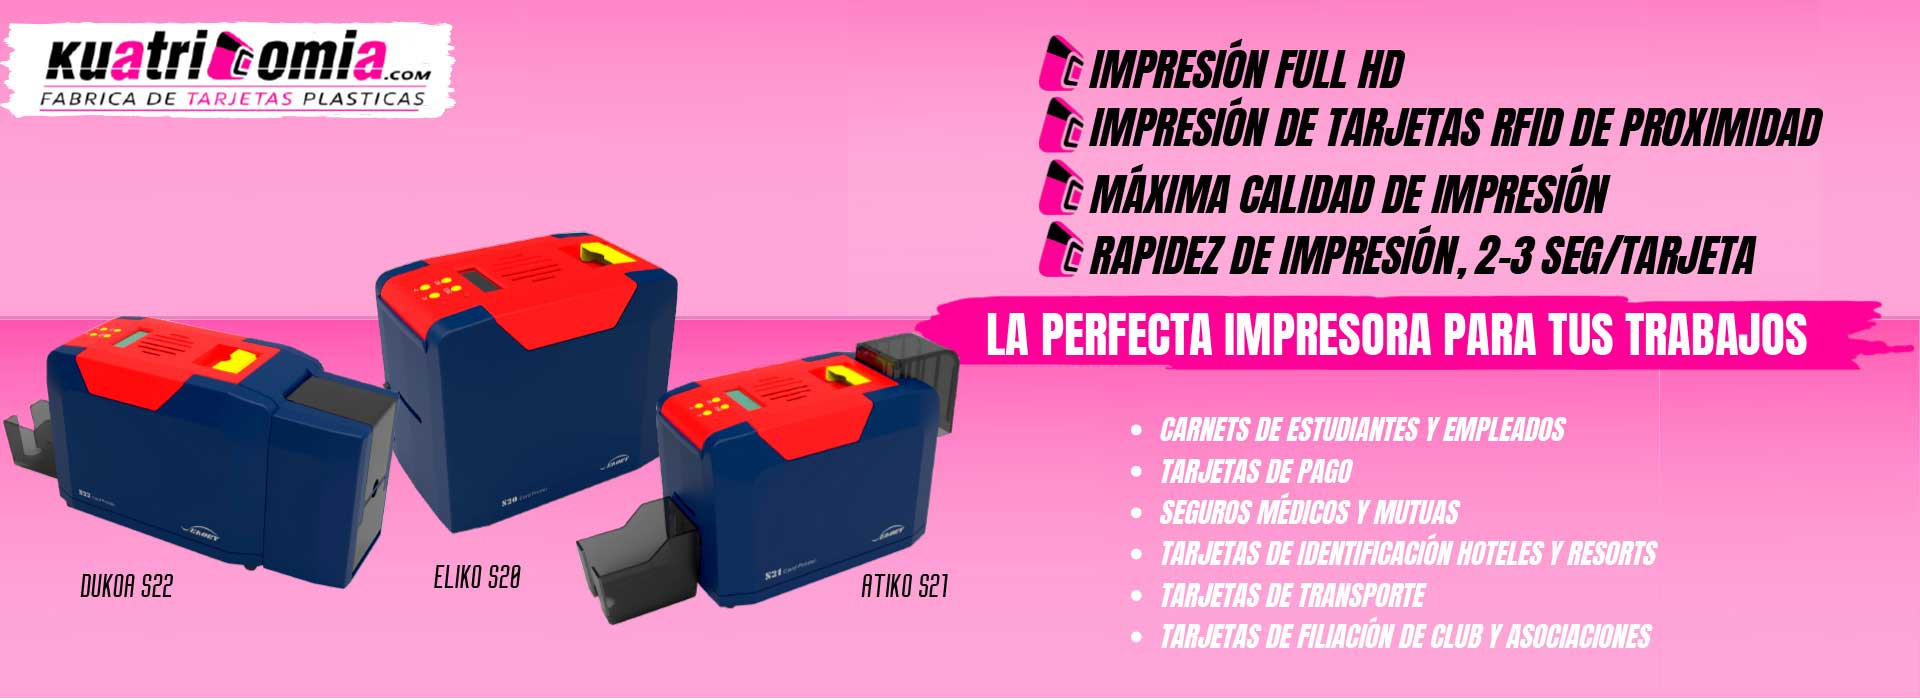 Impresoras_para_tarjetas_plasticas_pvc.jpg